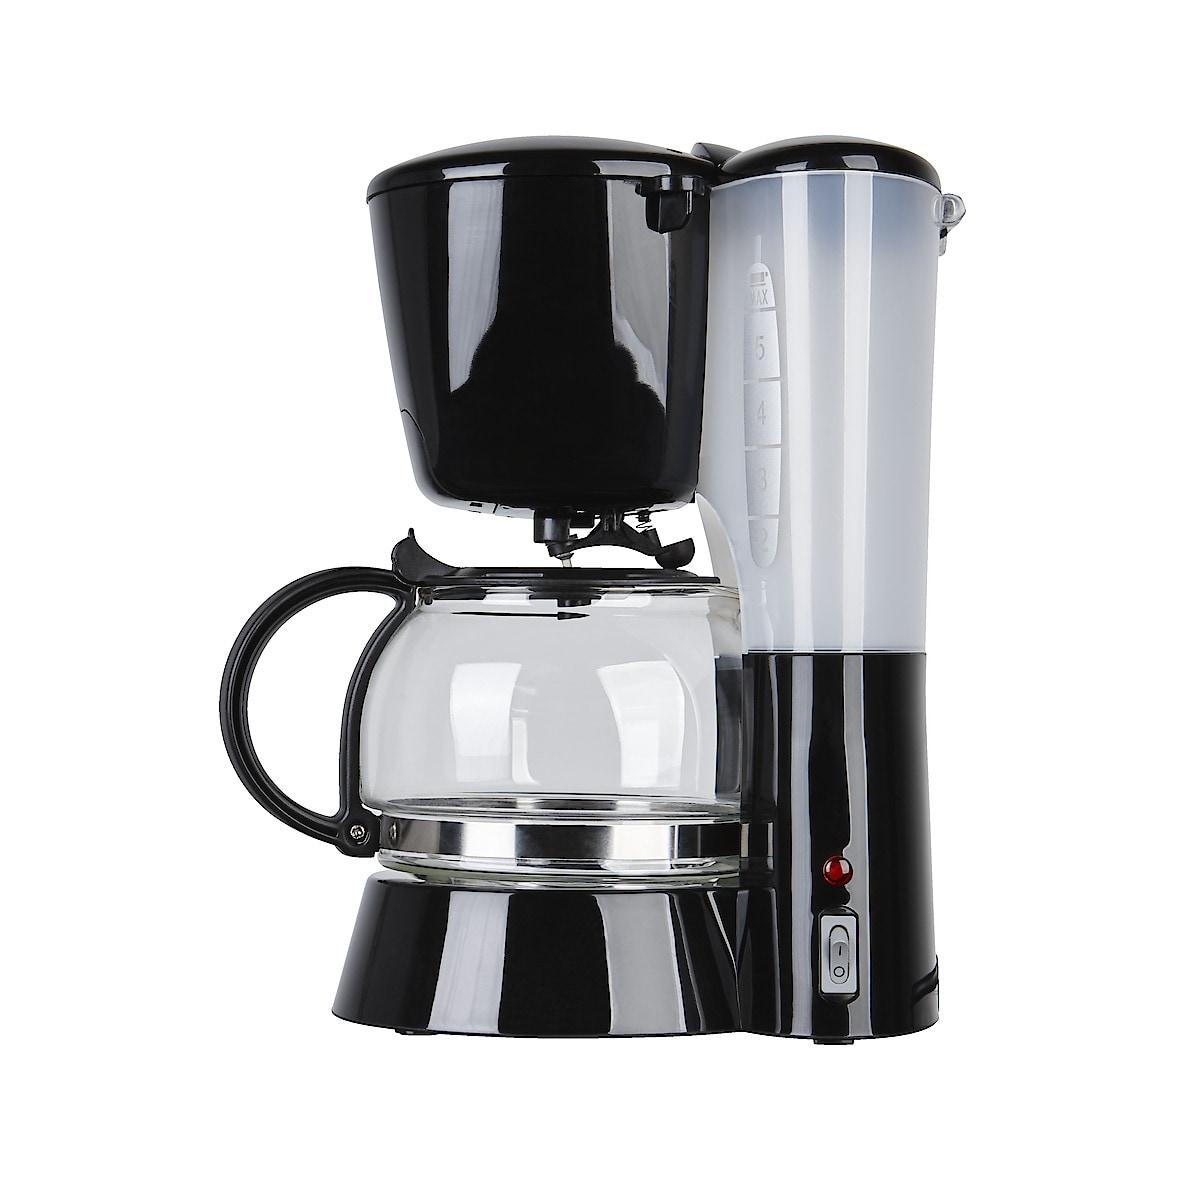 bra liten kaffebryggare